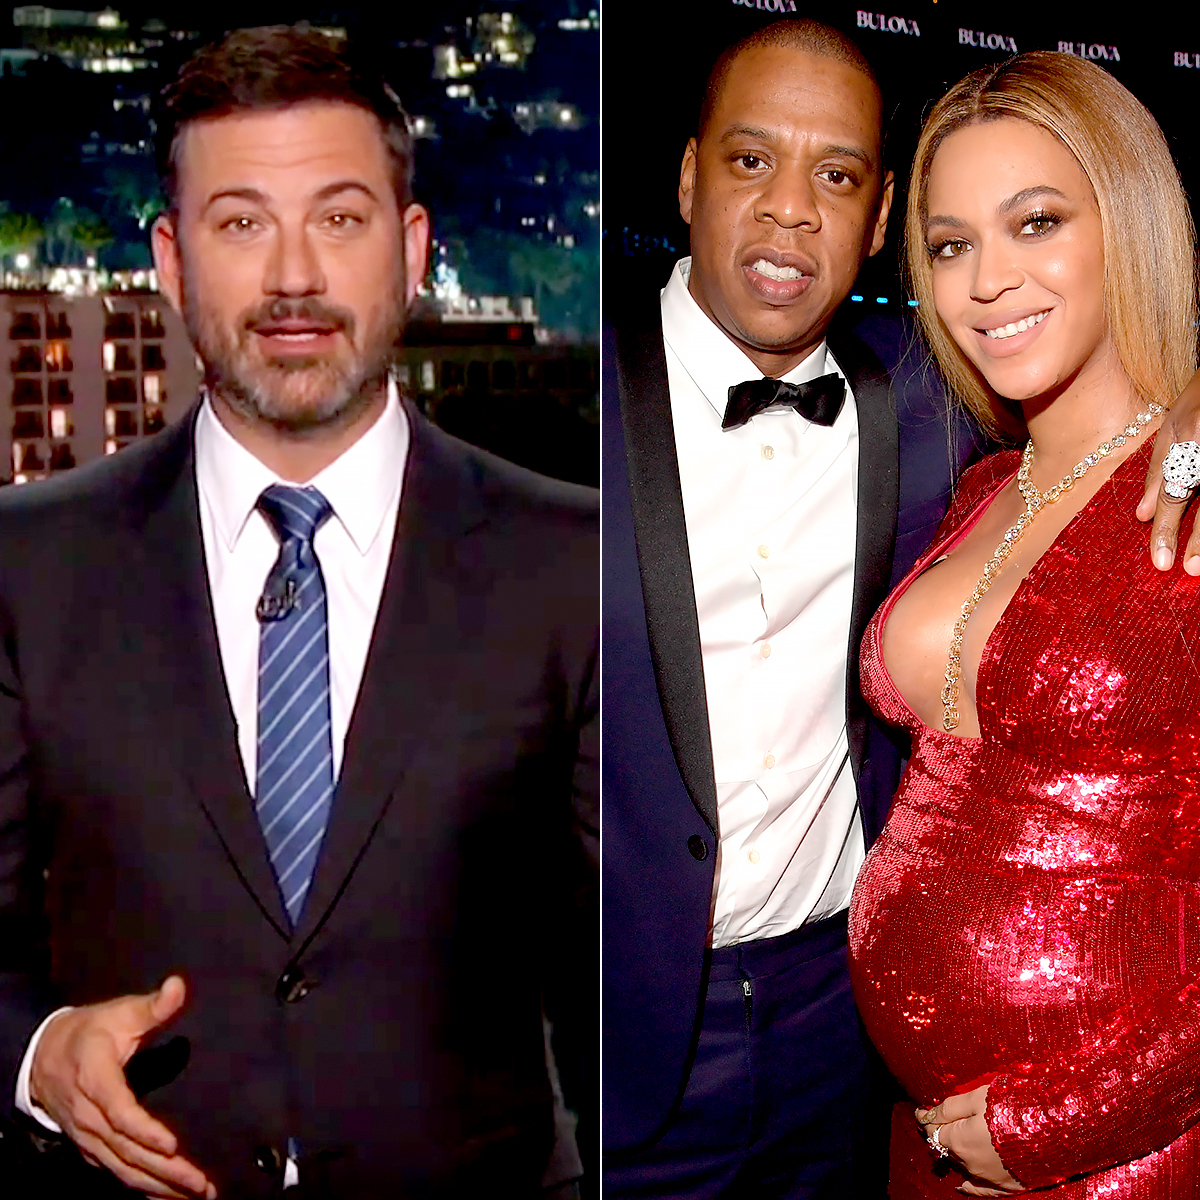 Flipboard: Jimmy Kimmel Pranks People With Hilarious Fake Names of ...